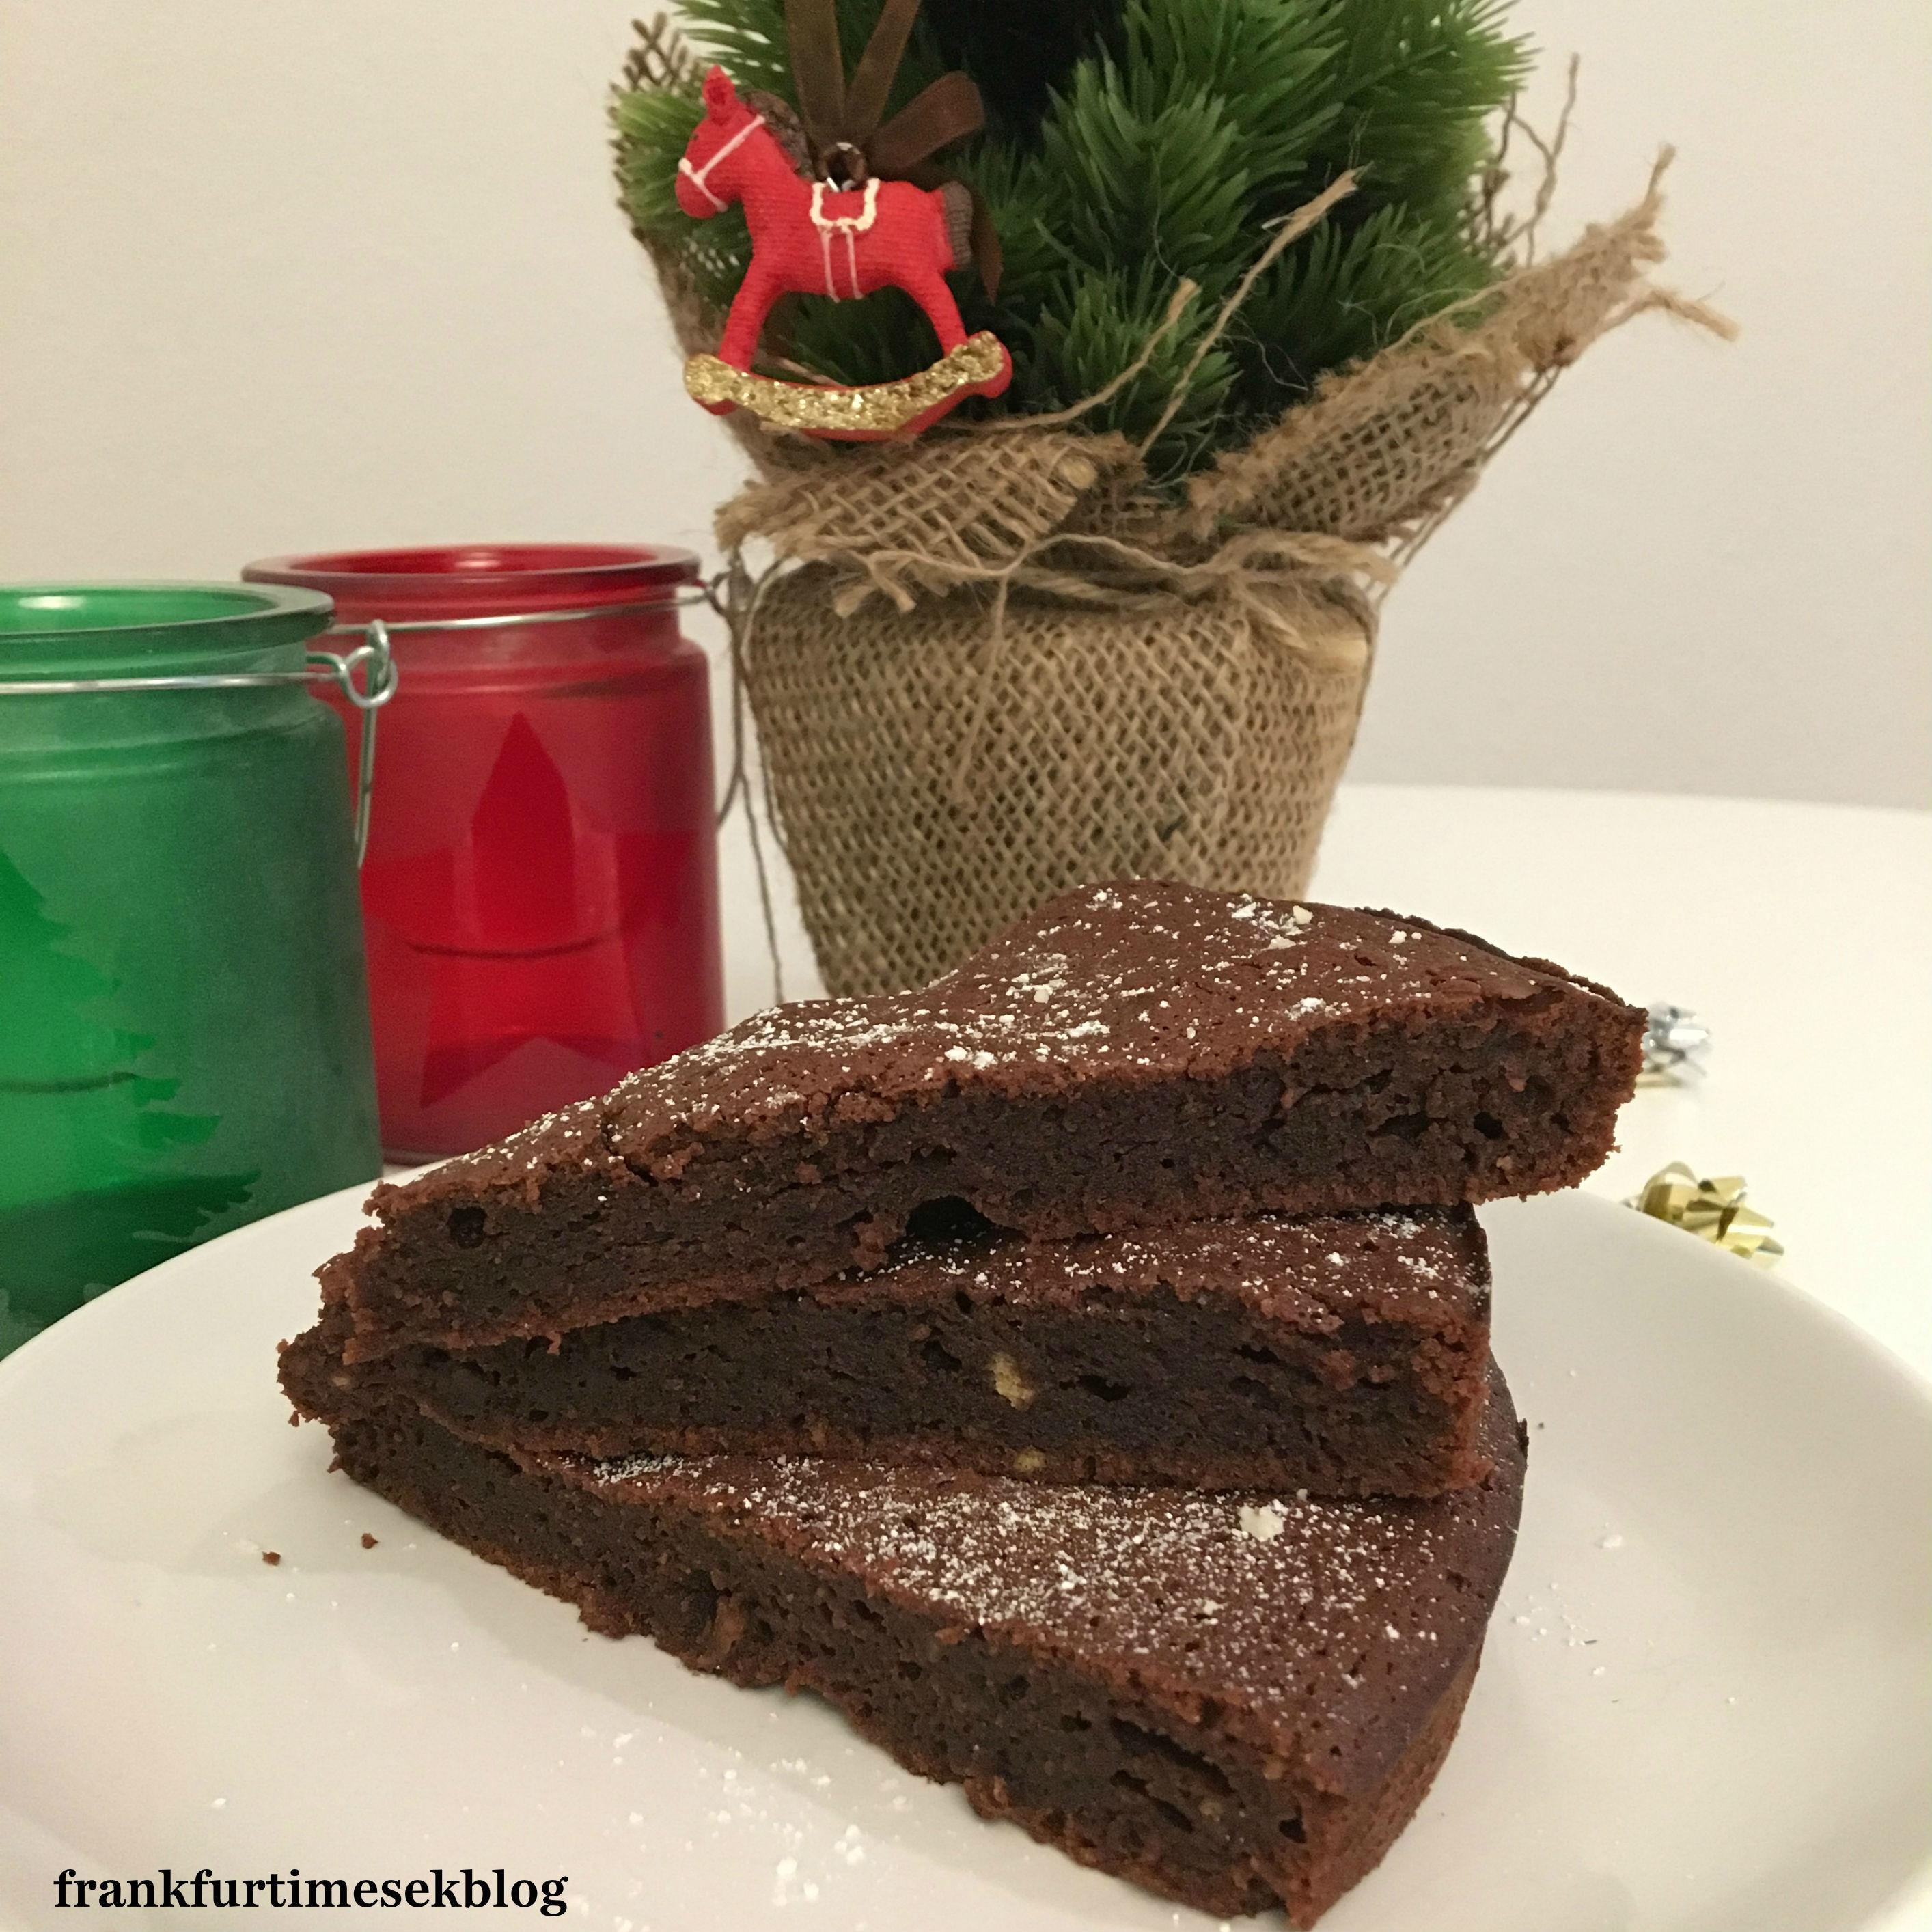 A karácsonyi brownie receptje - Advent I.